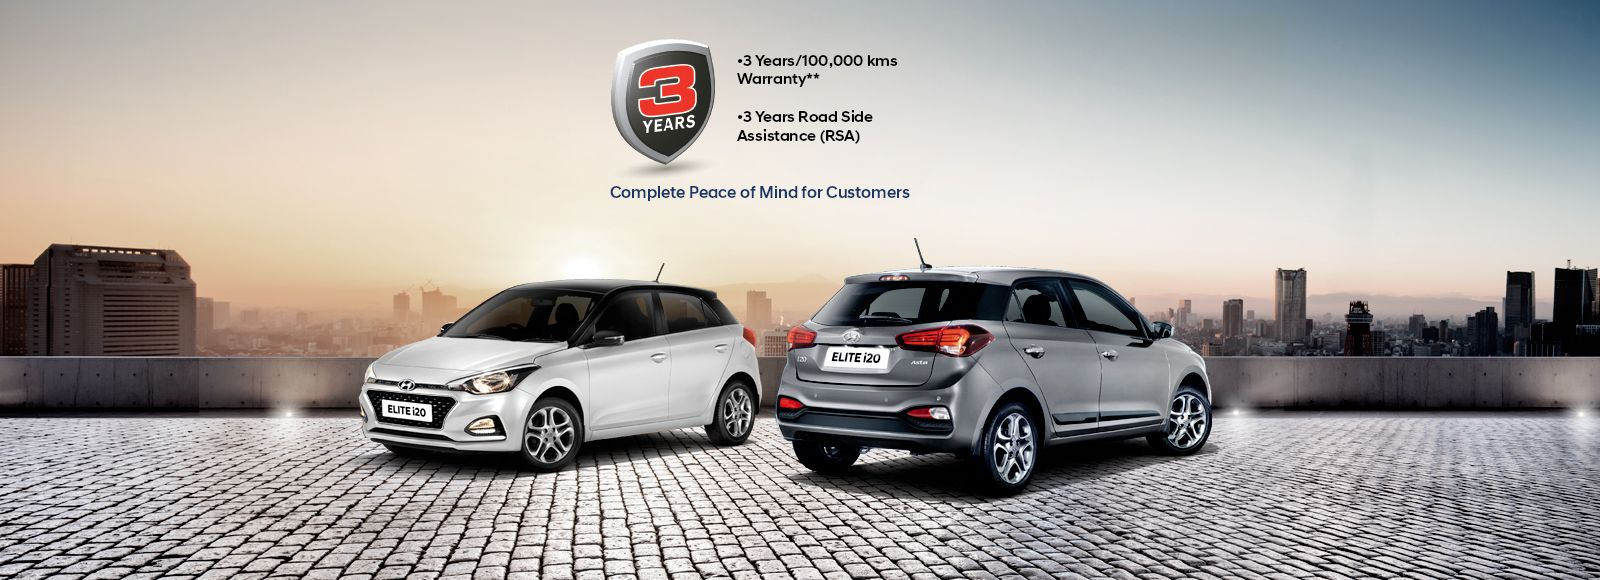 Elite I20 Drive A Showstopper Talwar Hyundai Car Dealer In Hyderabad In 2020 Hyundai Cars Hyundai Car Dealer